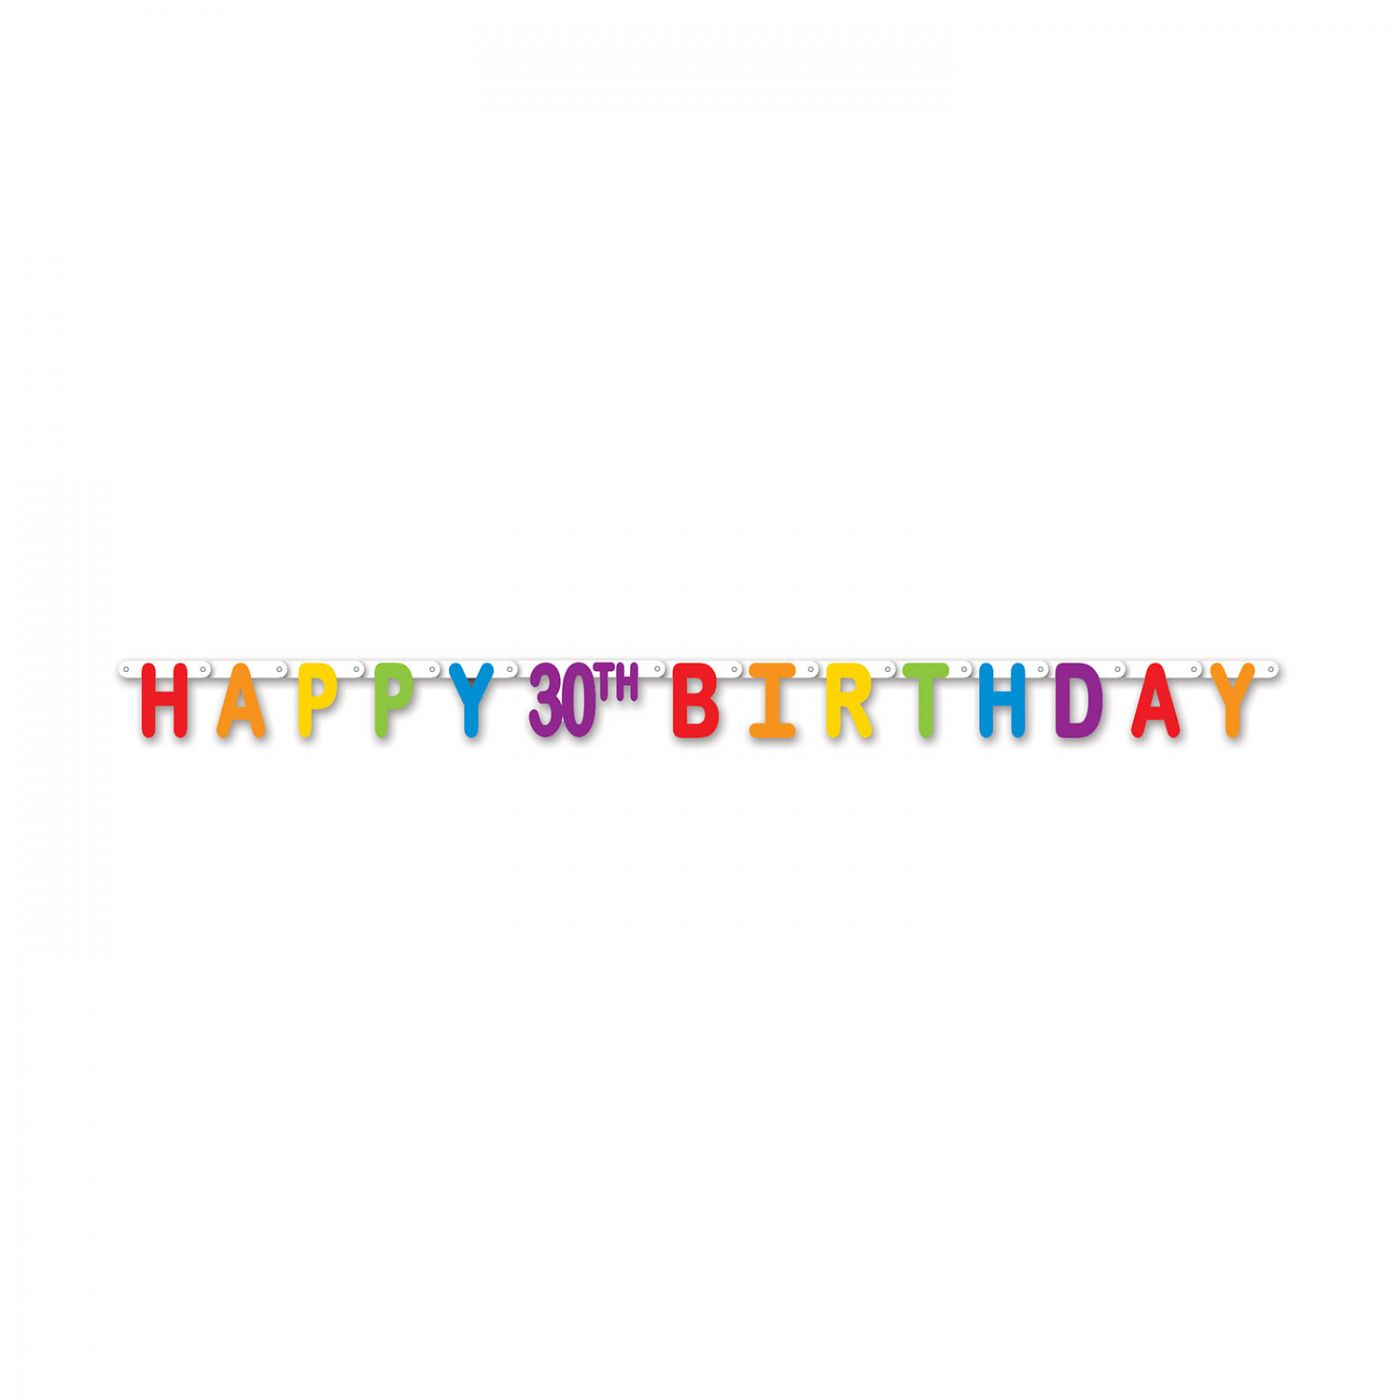 Happy 30th Birthday Streamer image